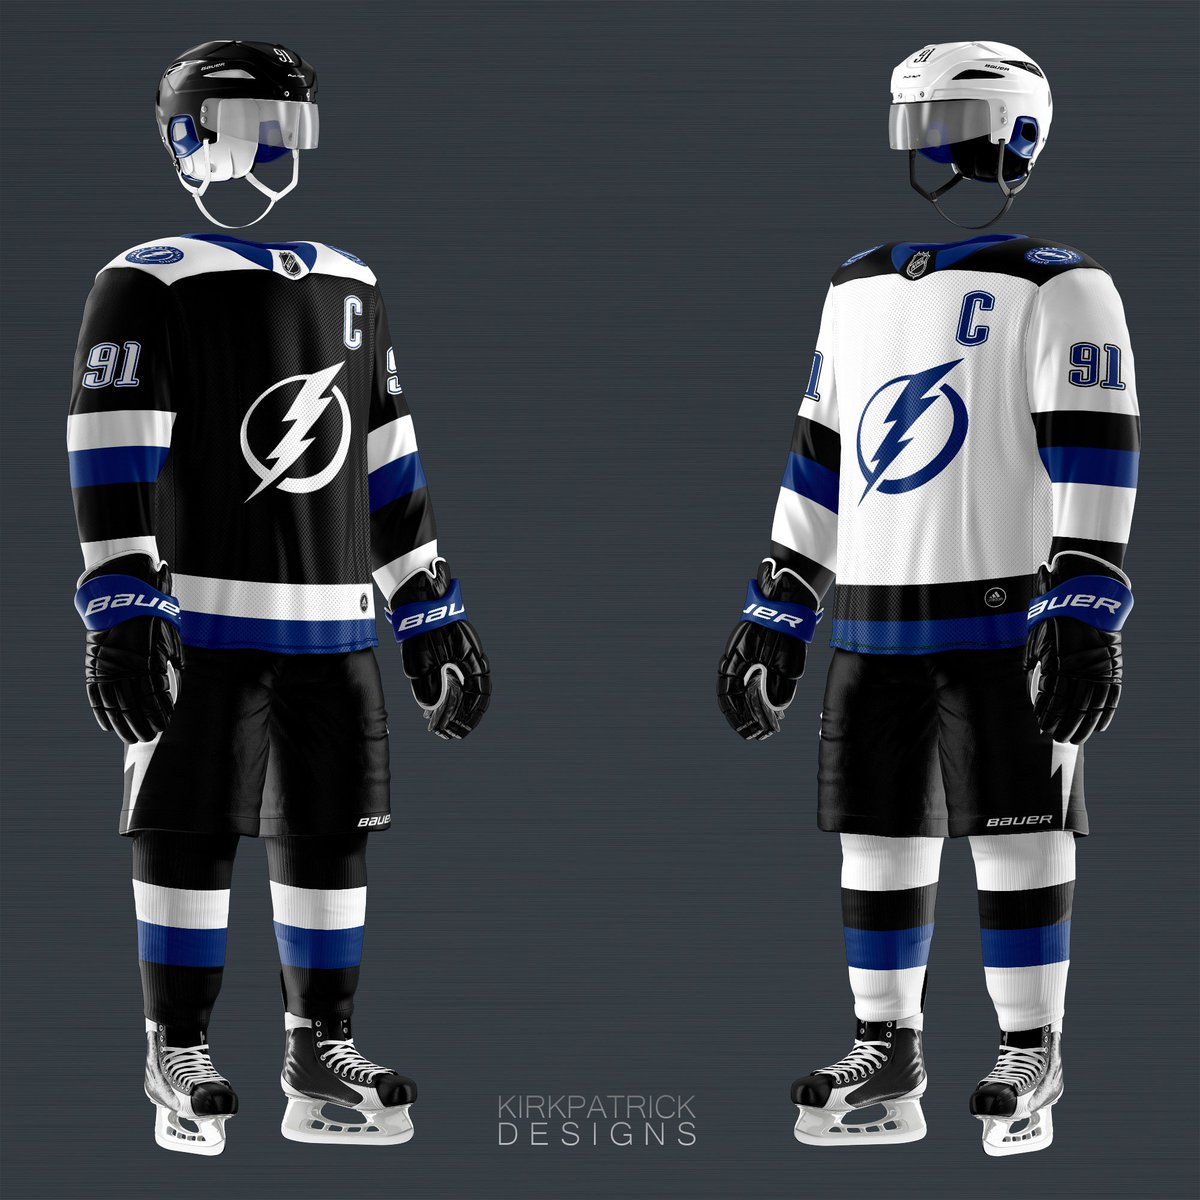 hot sale online 0932b 1c2c3 Tampa Bay Lightning on Twitter: